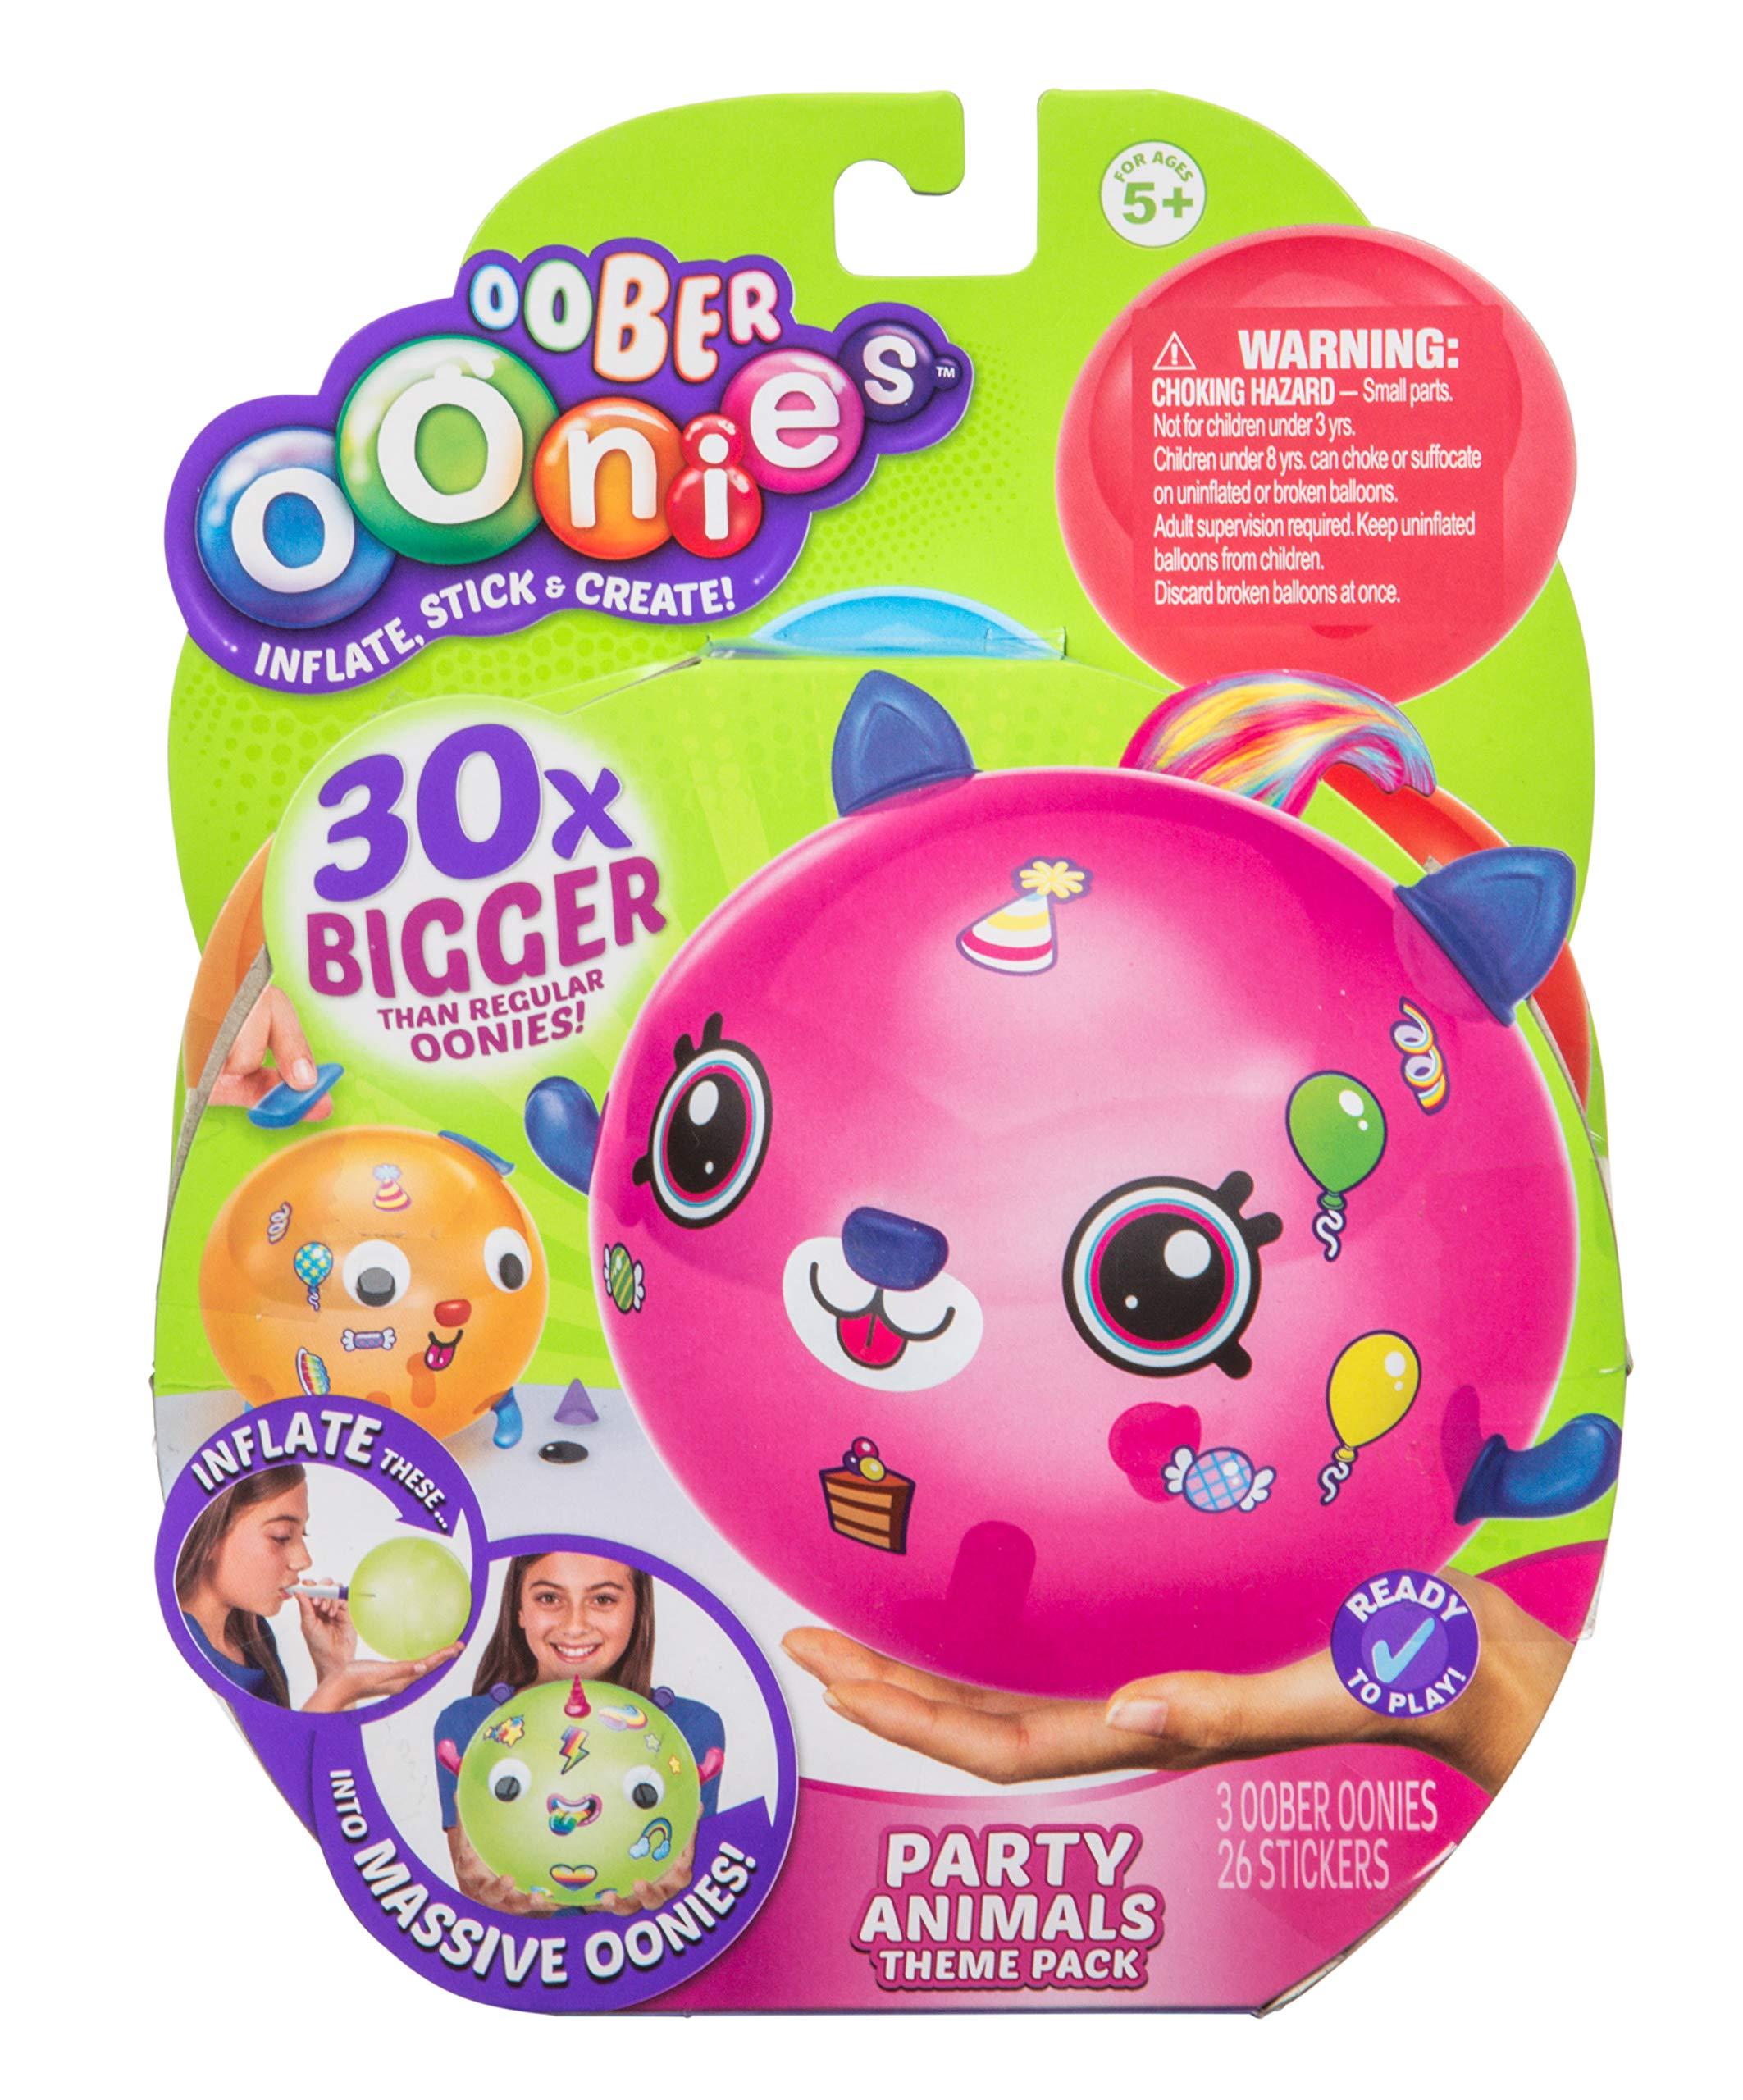 Oonies Oober Theme Pack - Party Animals